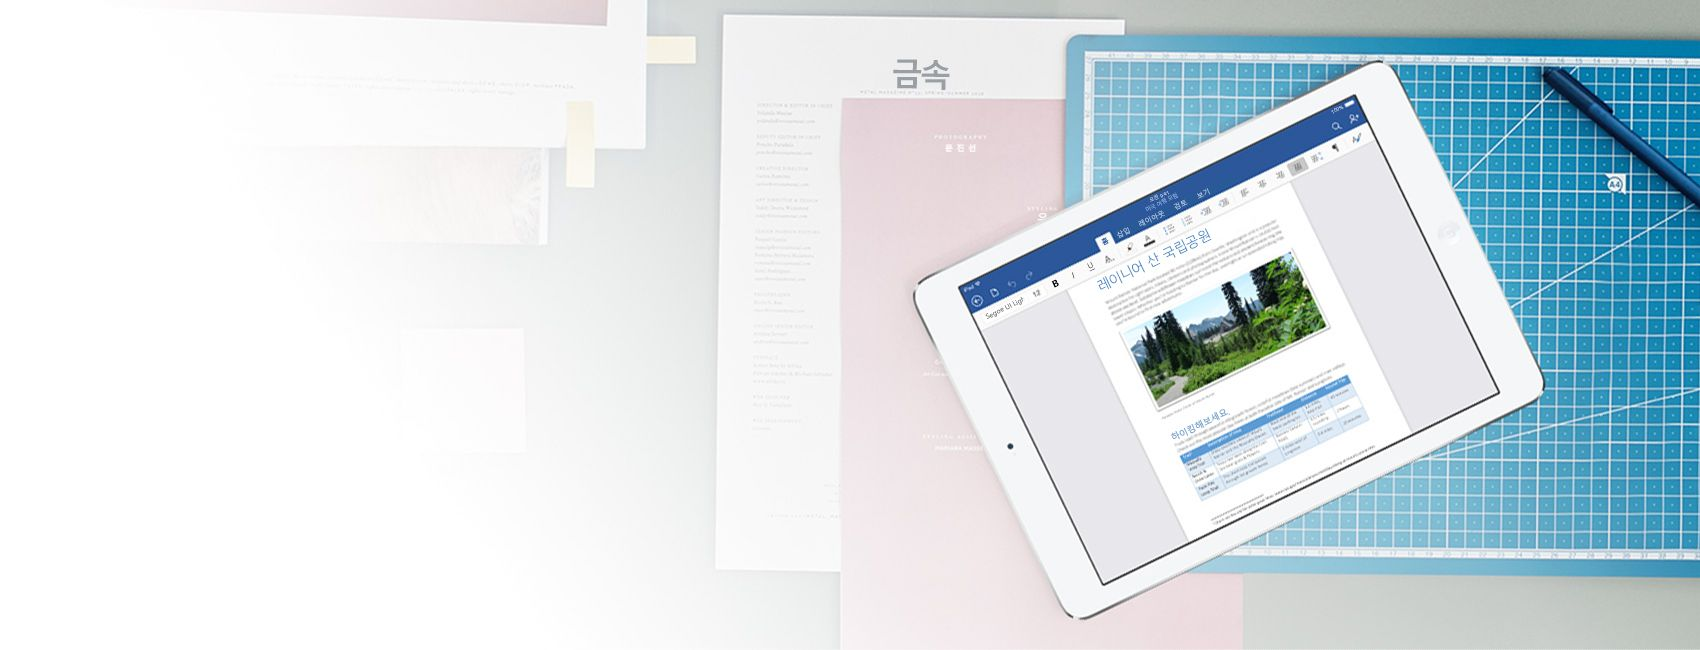 iOS용 Word 앱에 레이니어 산 국립공원에 대한 Word 문서가 표시된 iPad